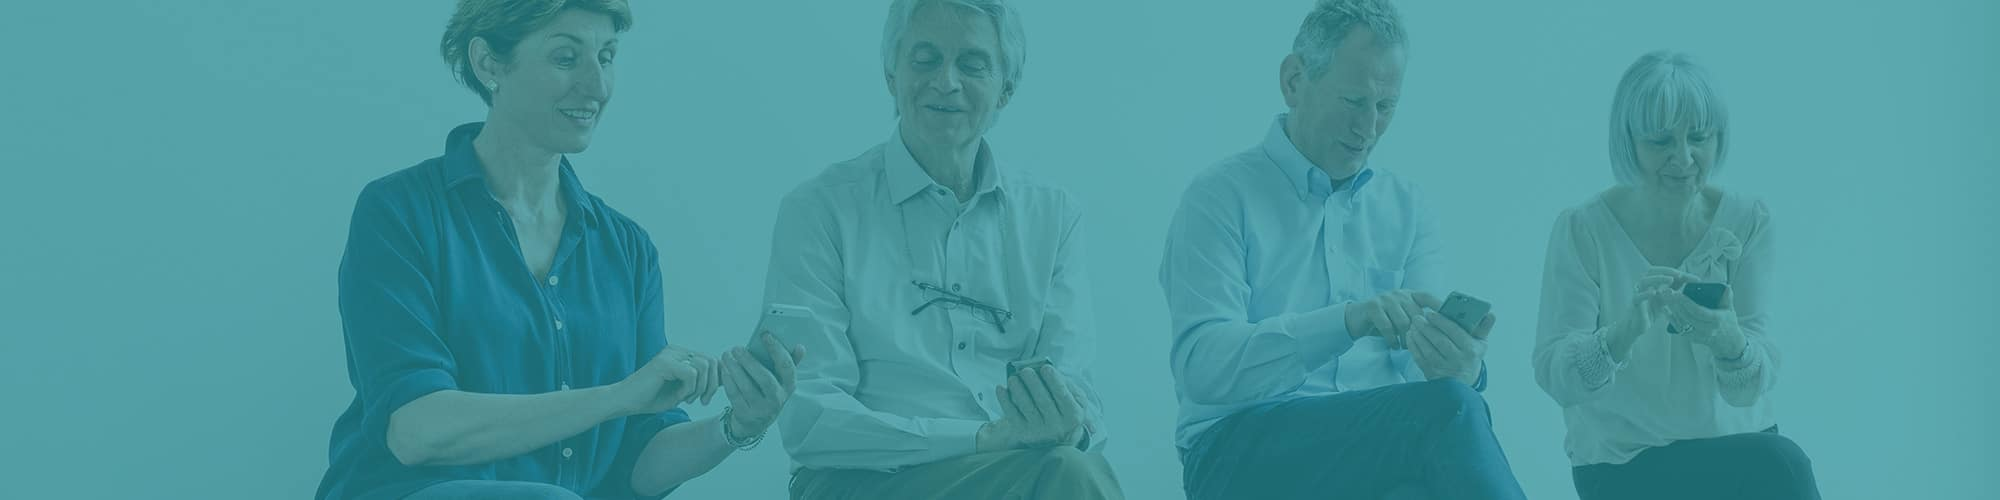 Daiichi Sankyo and FibriCheck announce digital partnership set to transform at-home AF detection and diagnosis